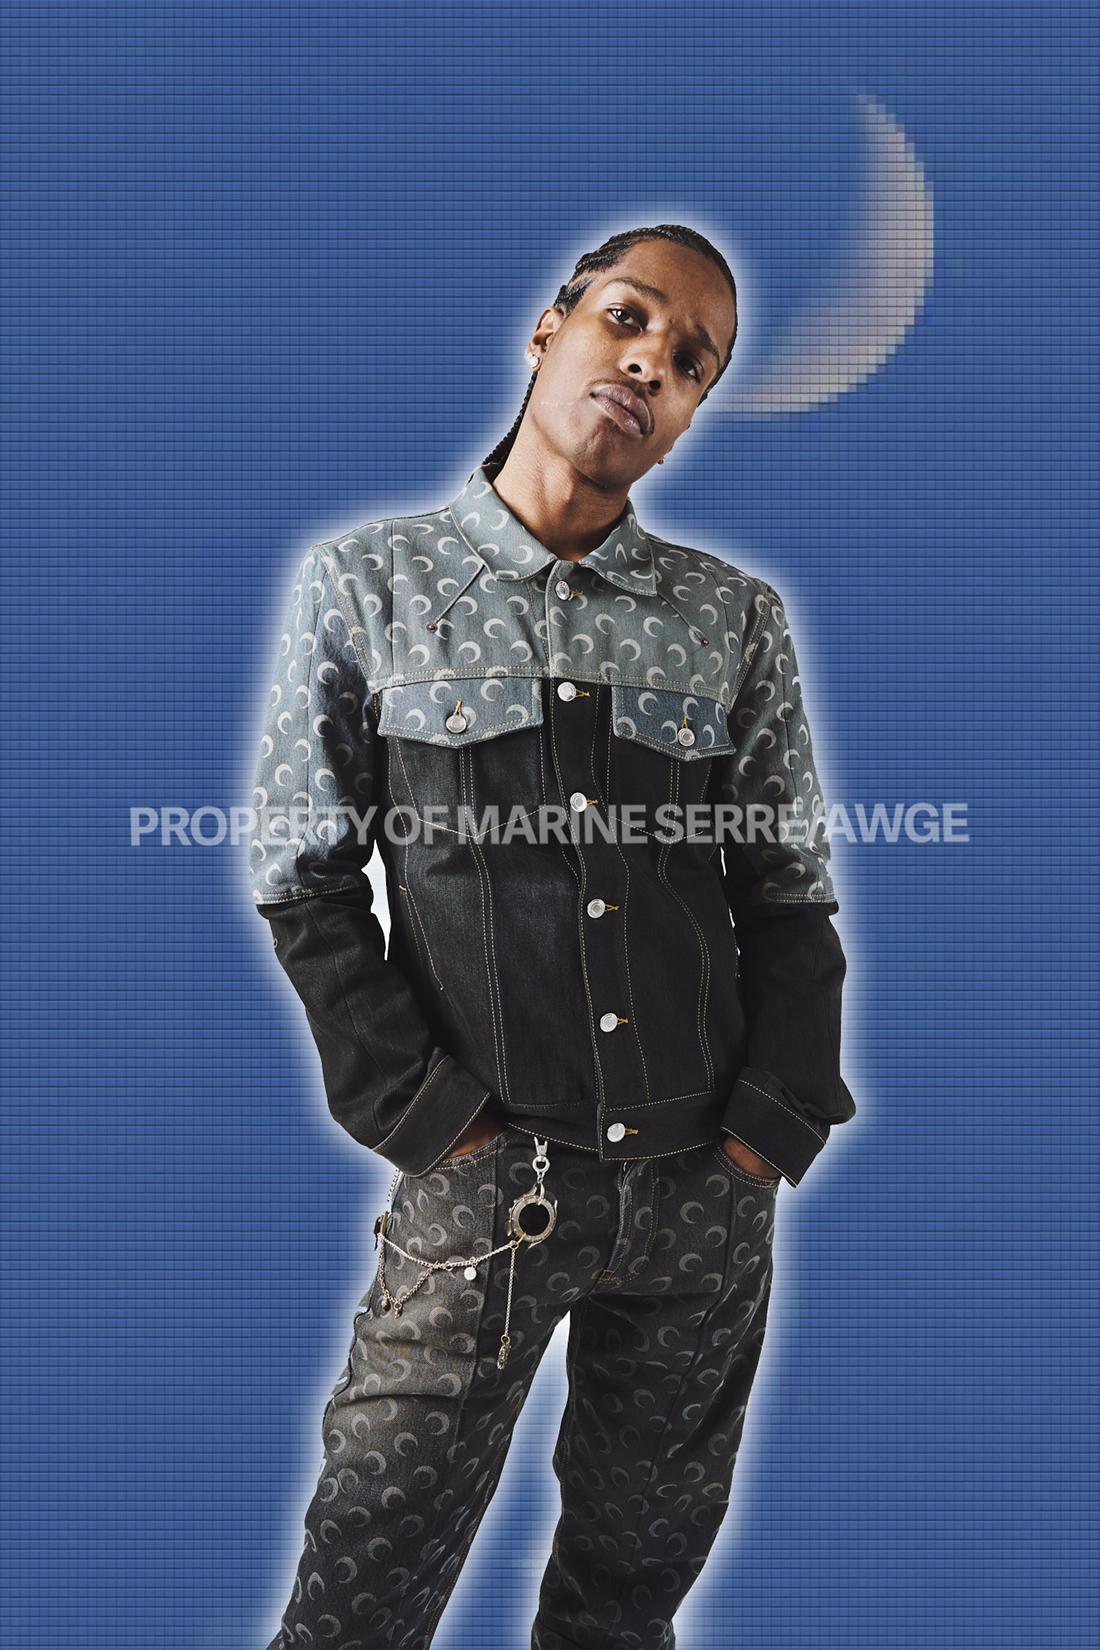 Marine Serre x AWGE A$AP Rocky